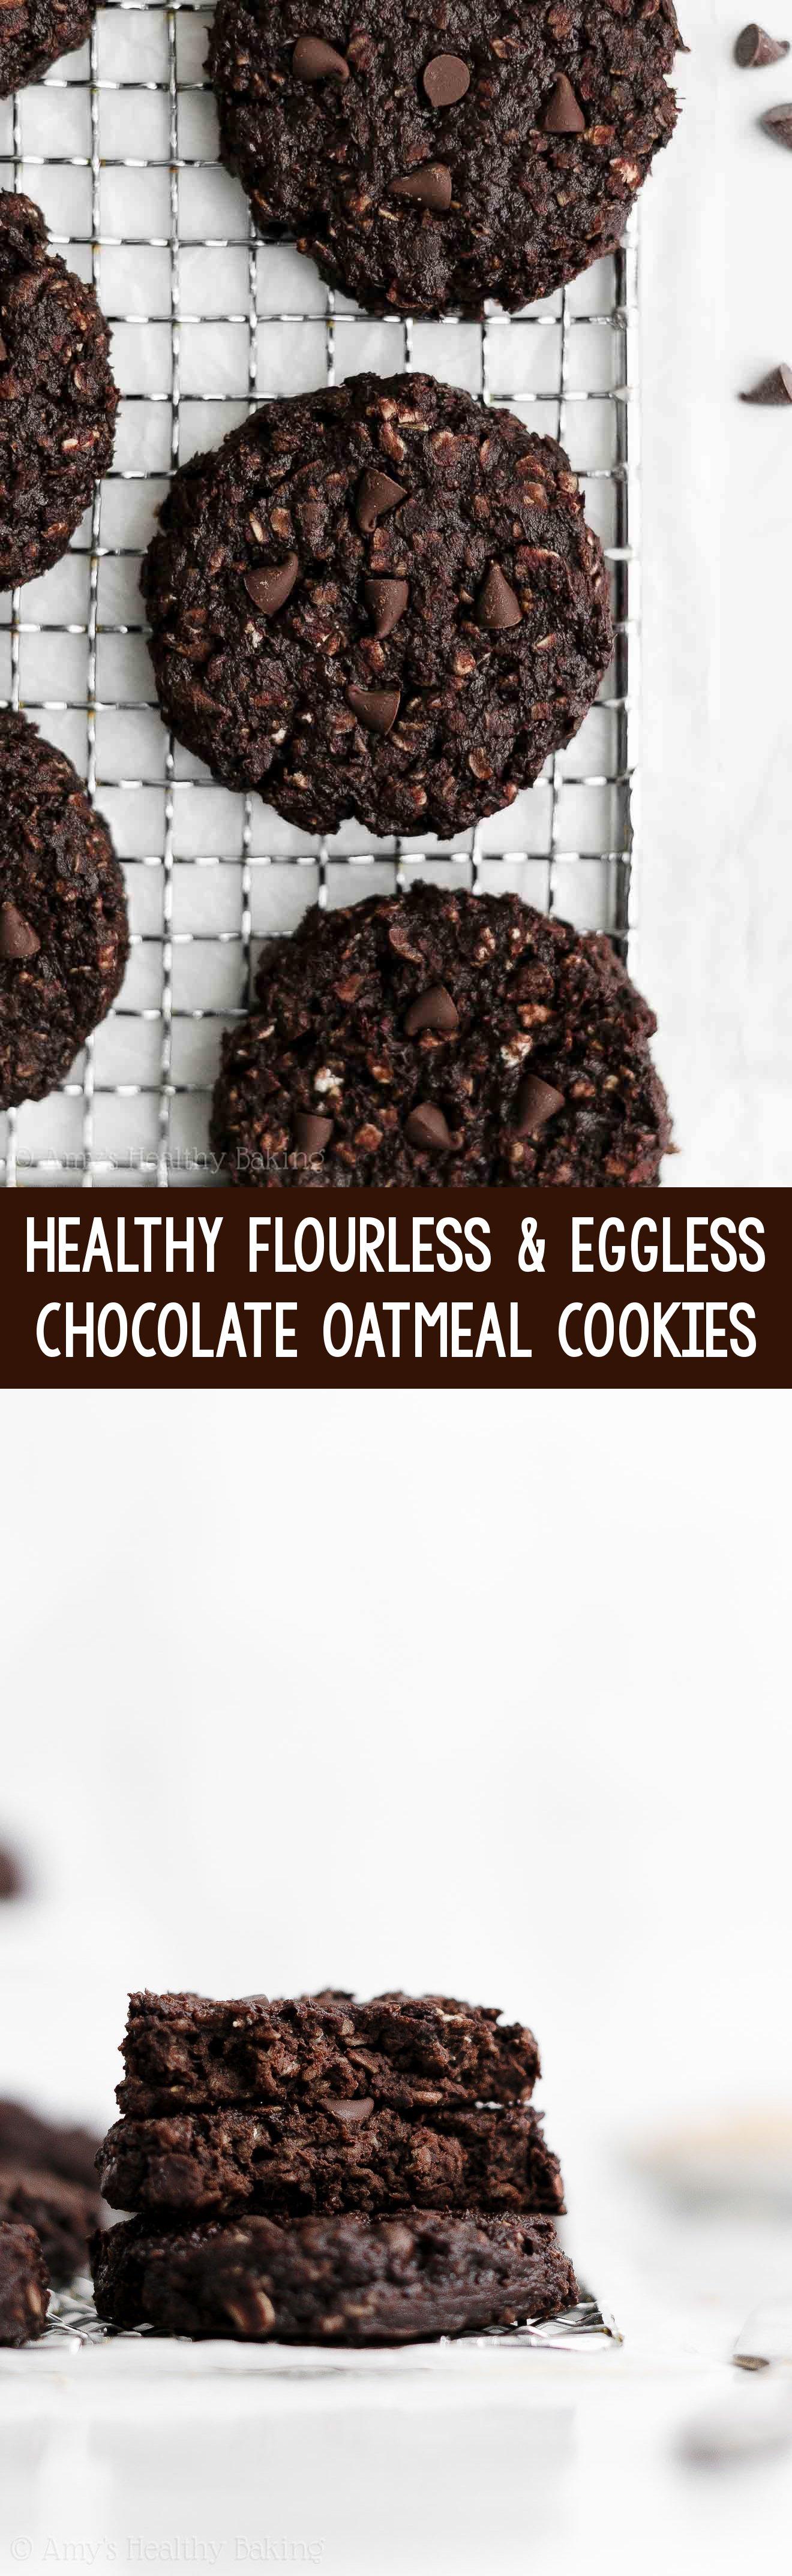 Best Easy Healthy Gluten Free Vegan Flourless Eggless Double Chocolate Oatmeal Cookies